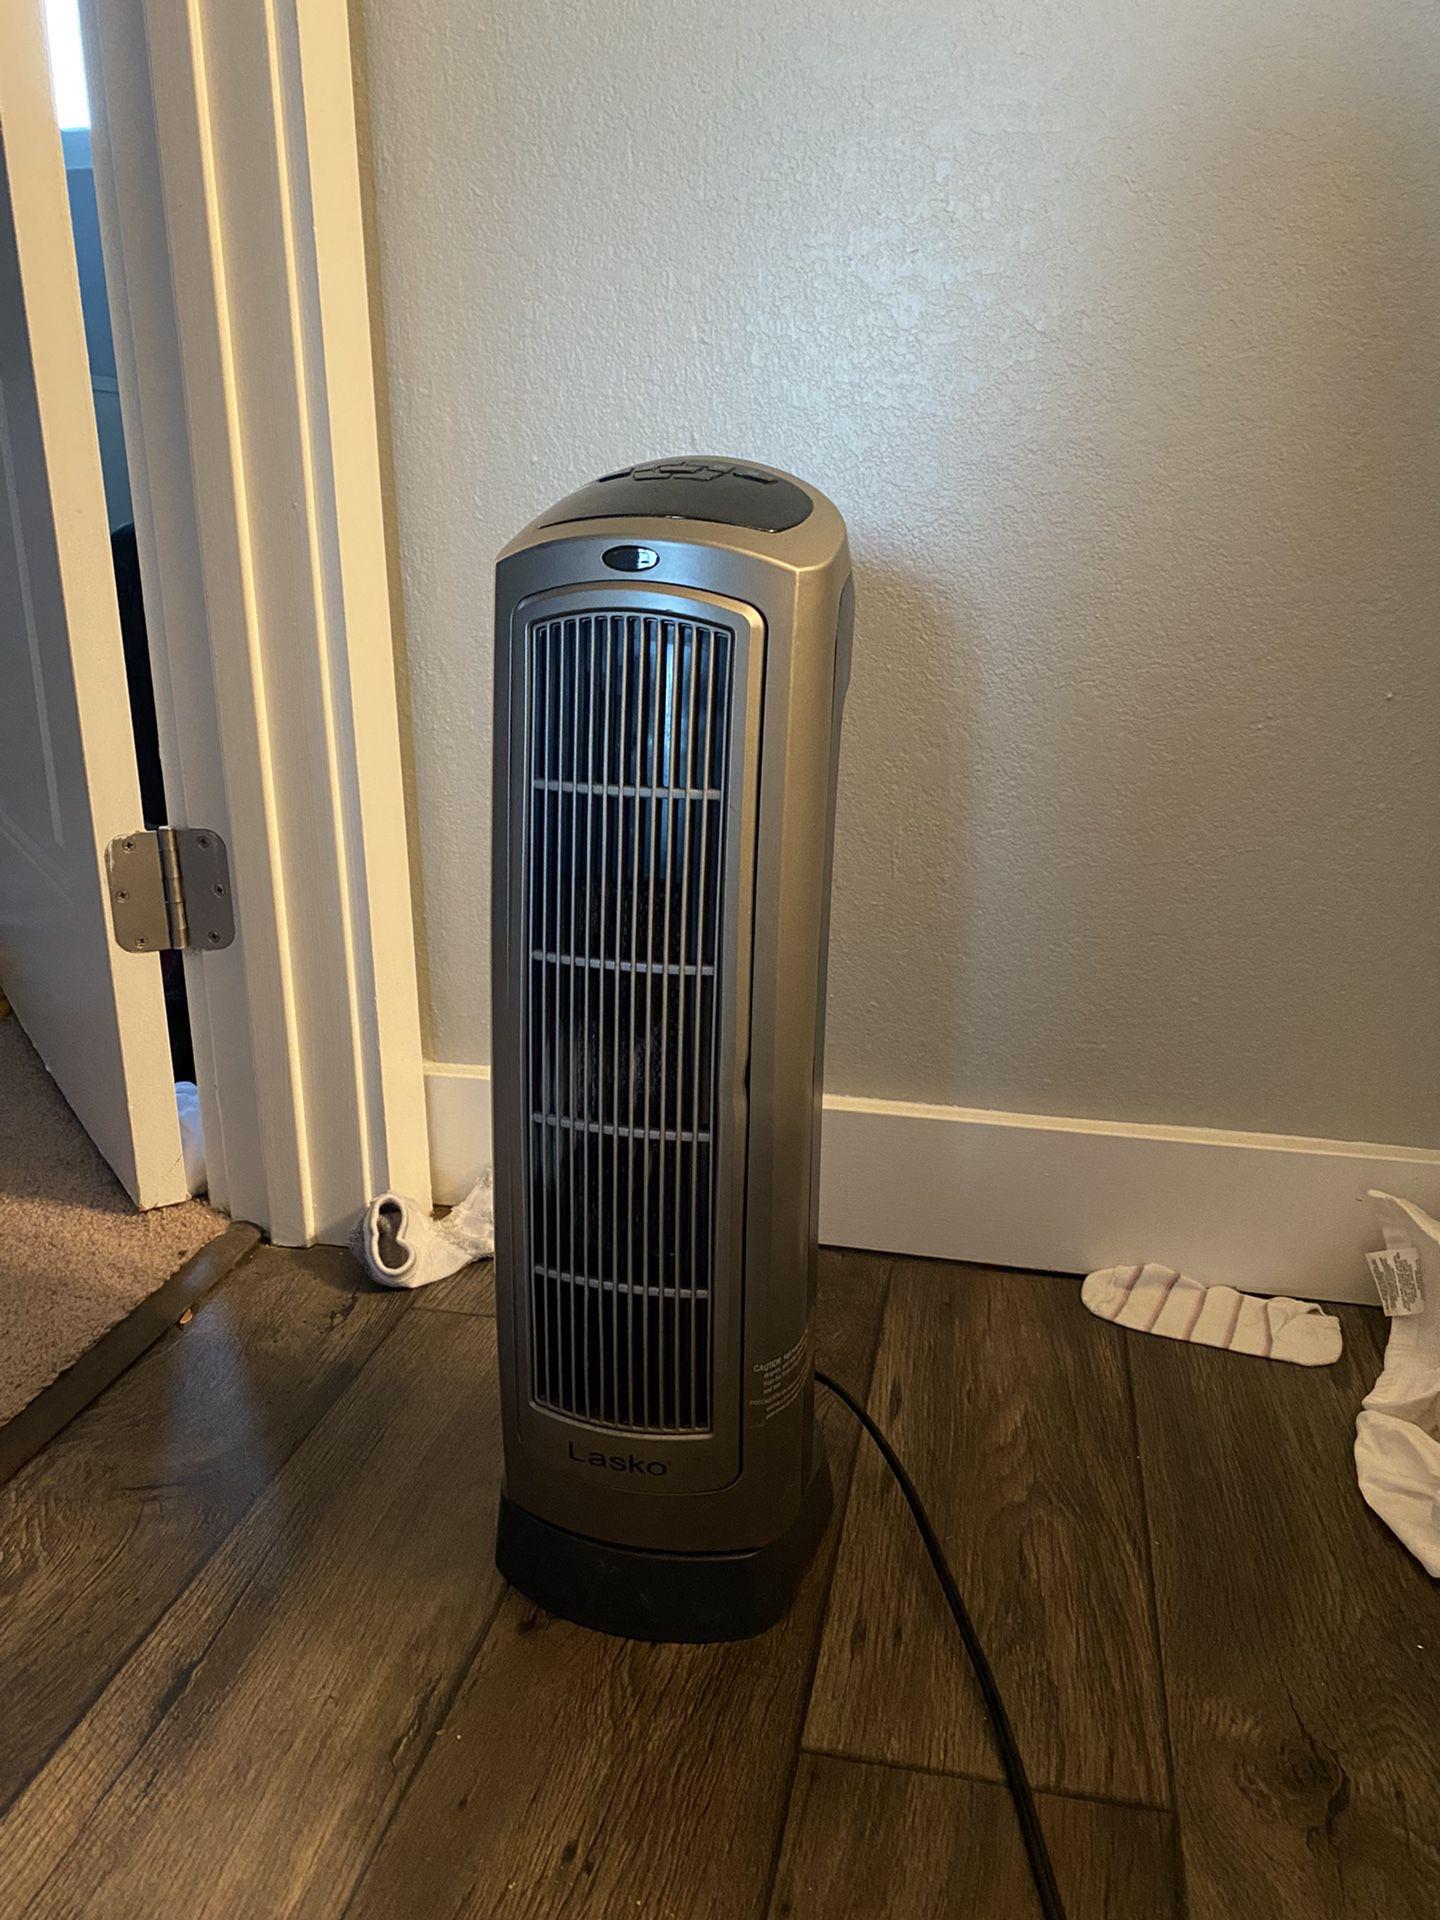 Lasko Portable Heater, Move Out Sale